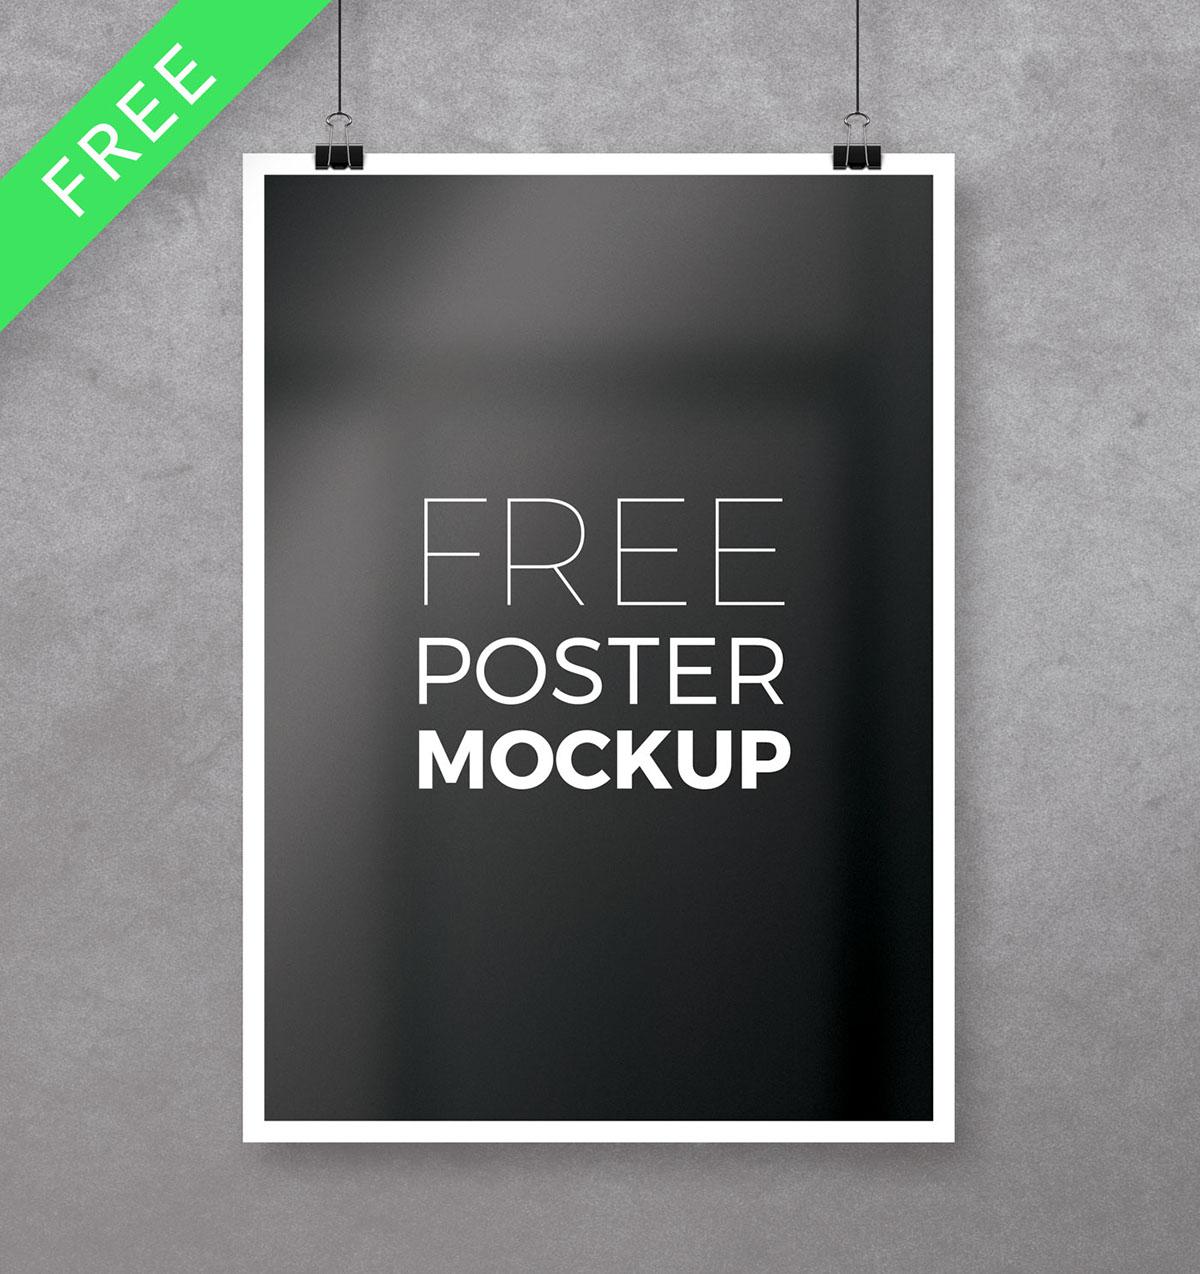 free poster psd freebie download flyer template photoshop Poster Mockup free mockup  Resume print a4 Mockup mock-up